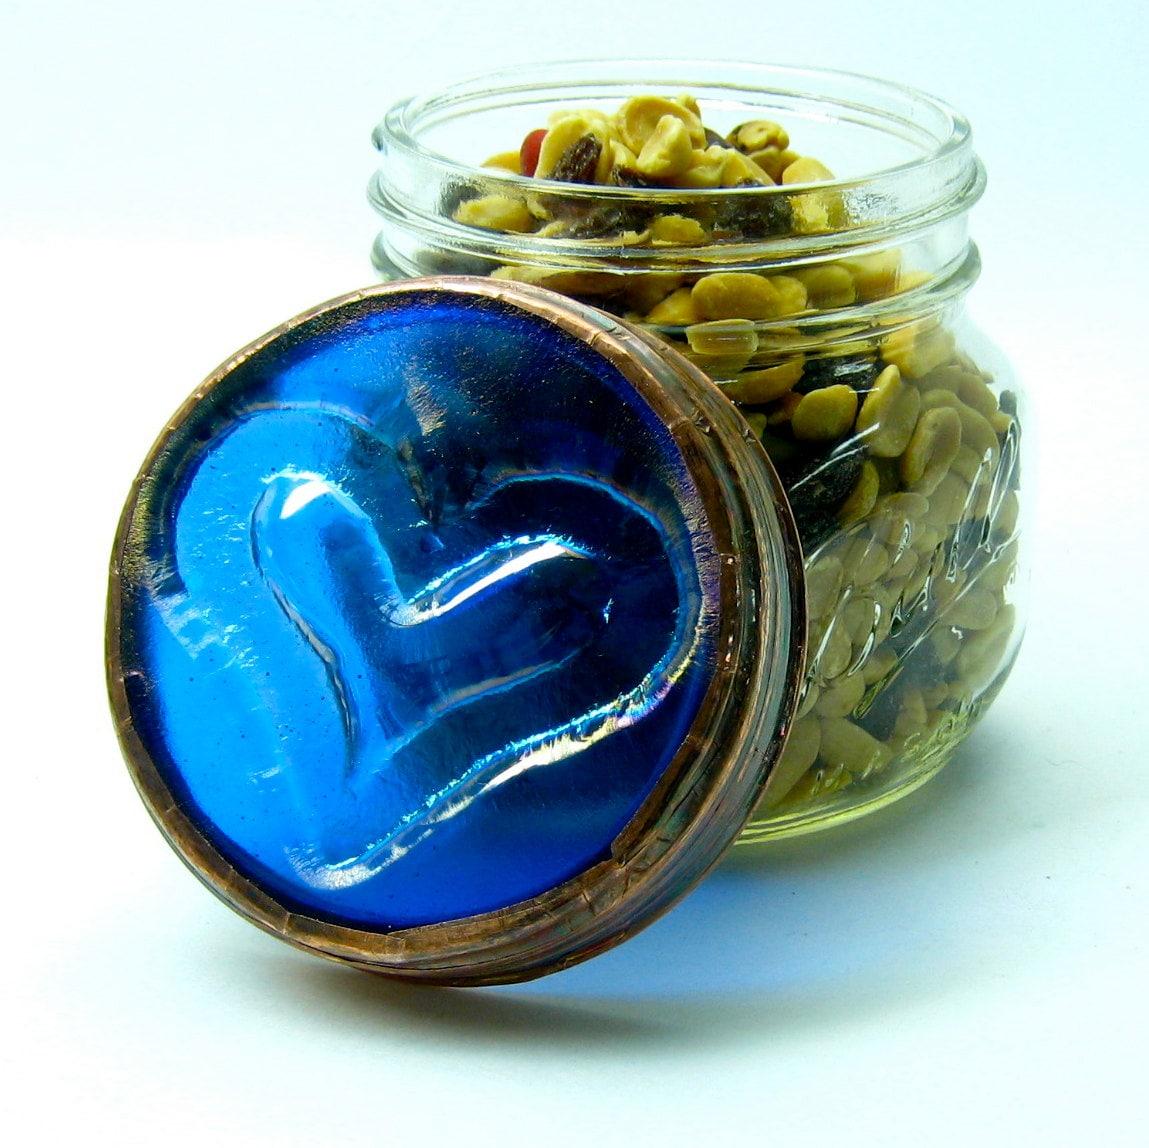 vintage blue mason ball canning jar with lid decorative. Black Bedroom Furniture Sets. Home Design Ideas